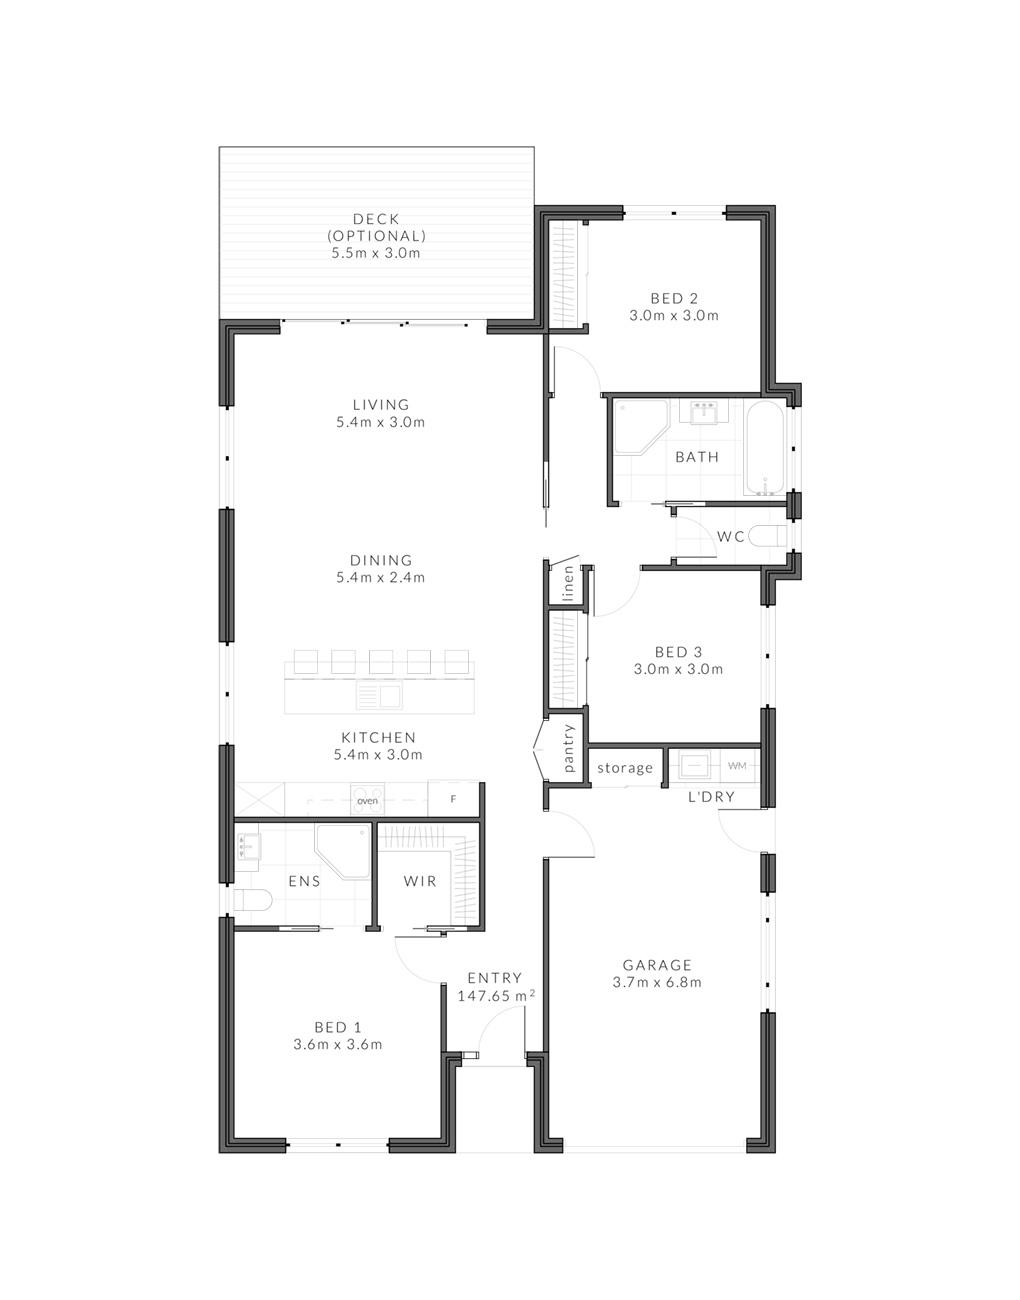 the-brookston-standard-new-home-design-hobart-tasmania